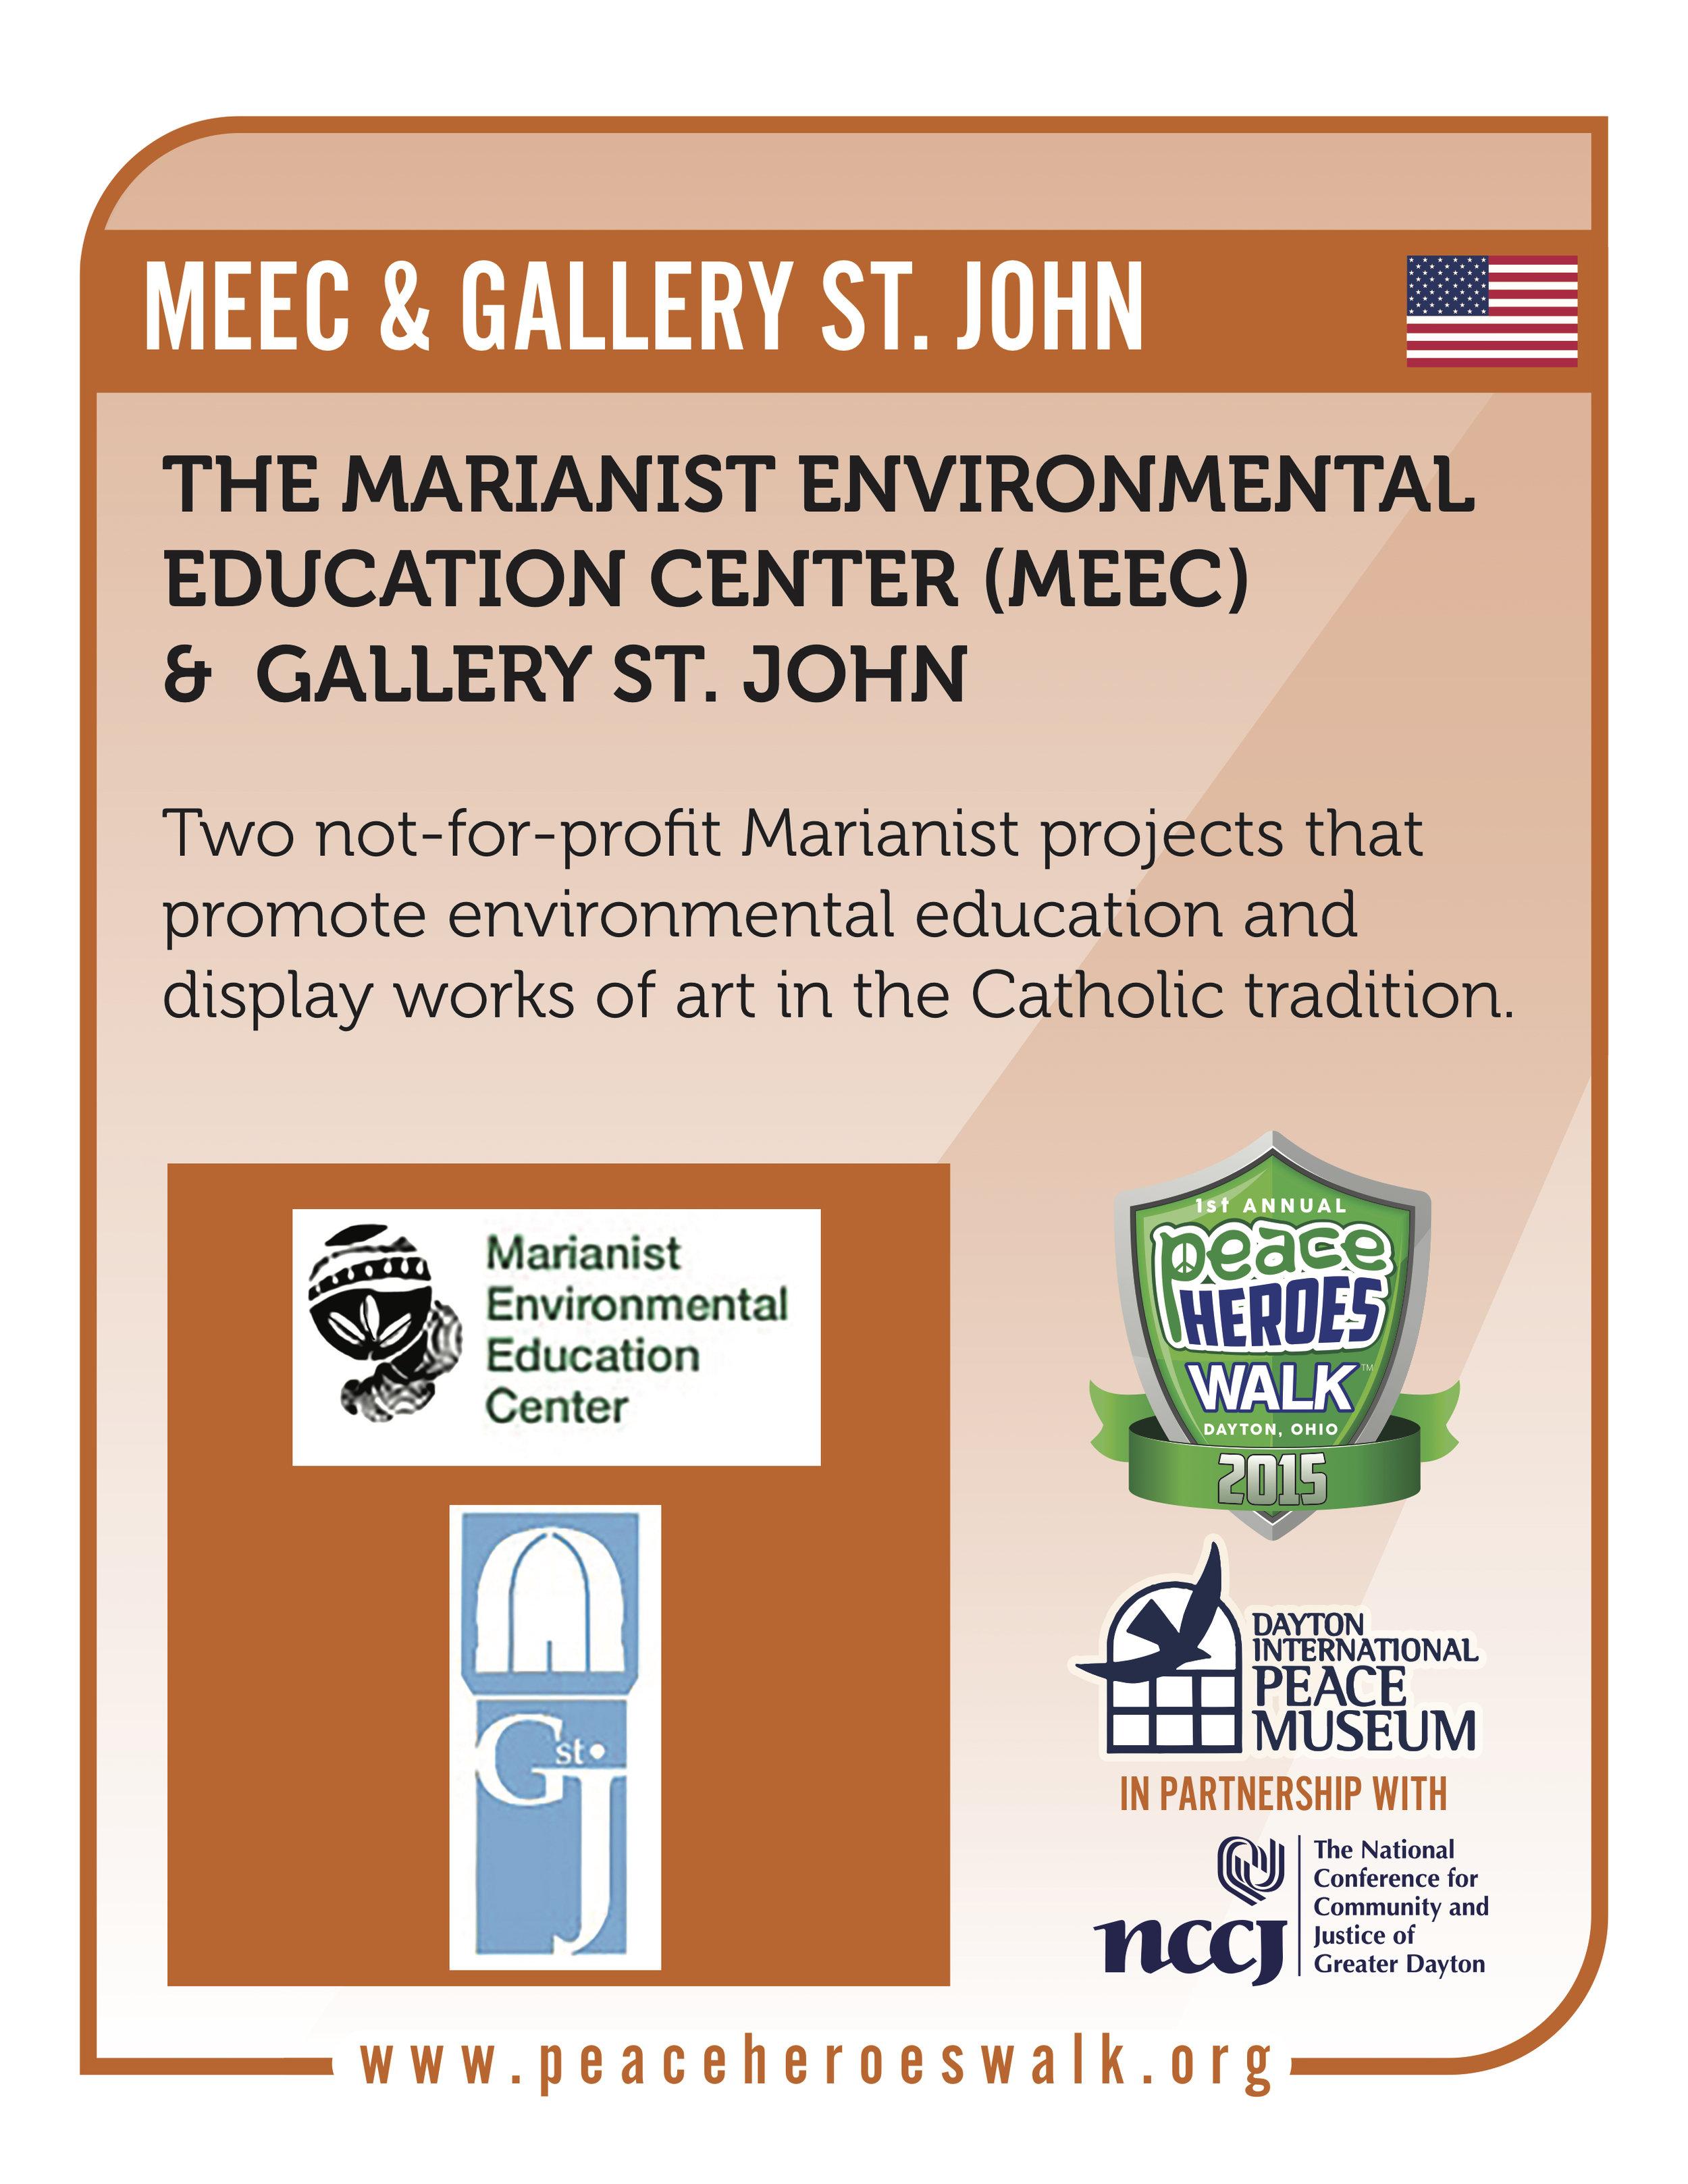 MEEC & Gallery St. John.jpg